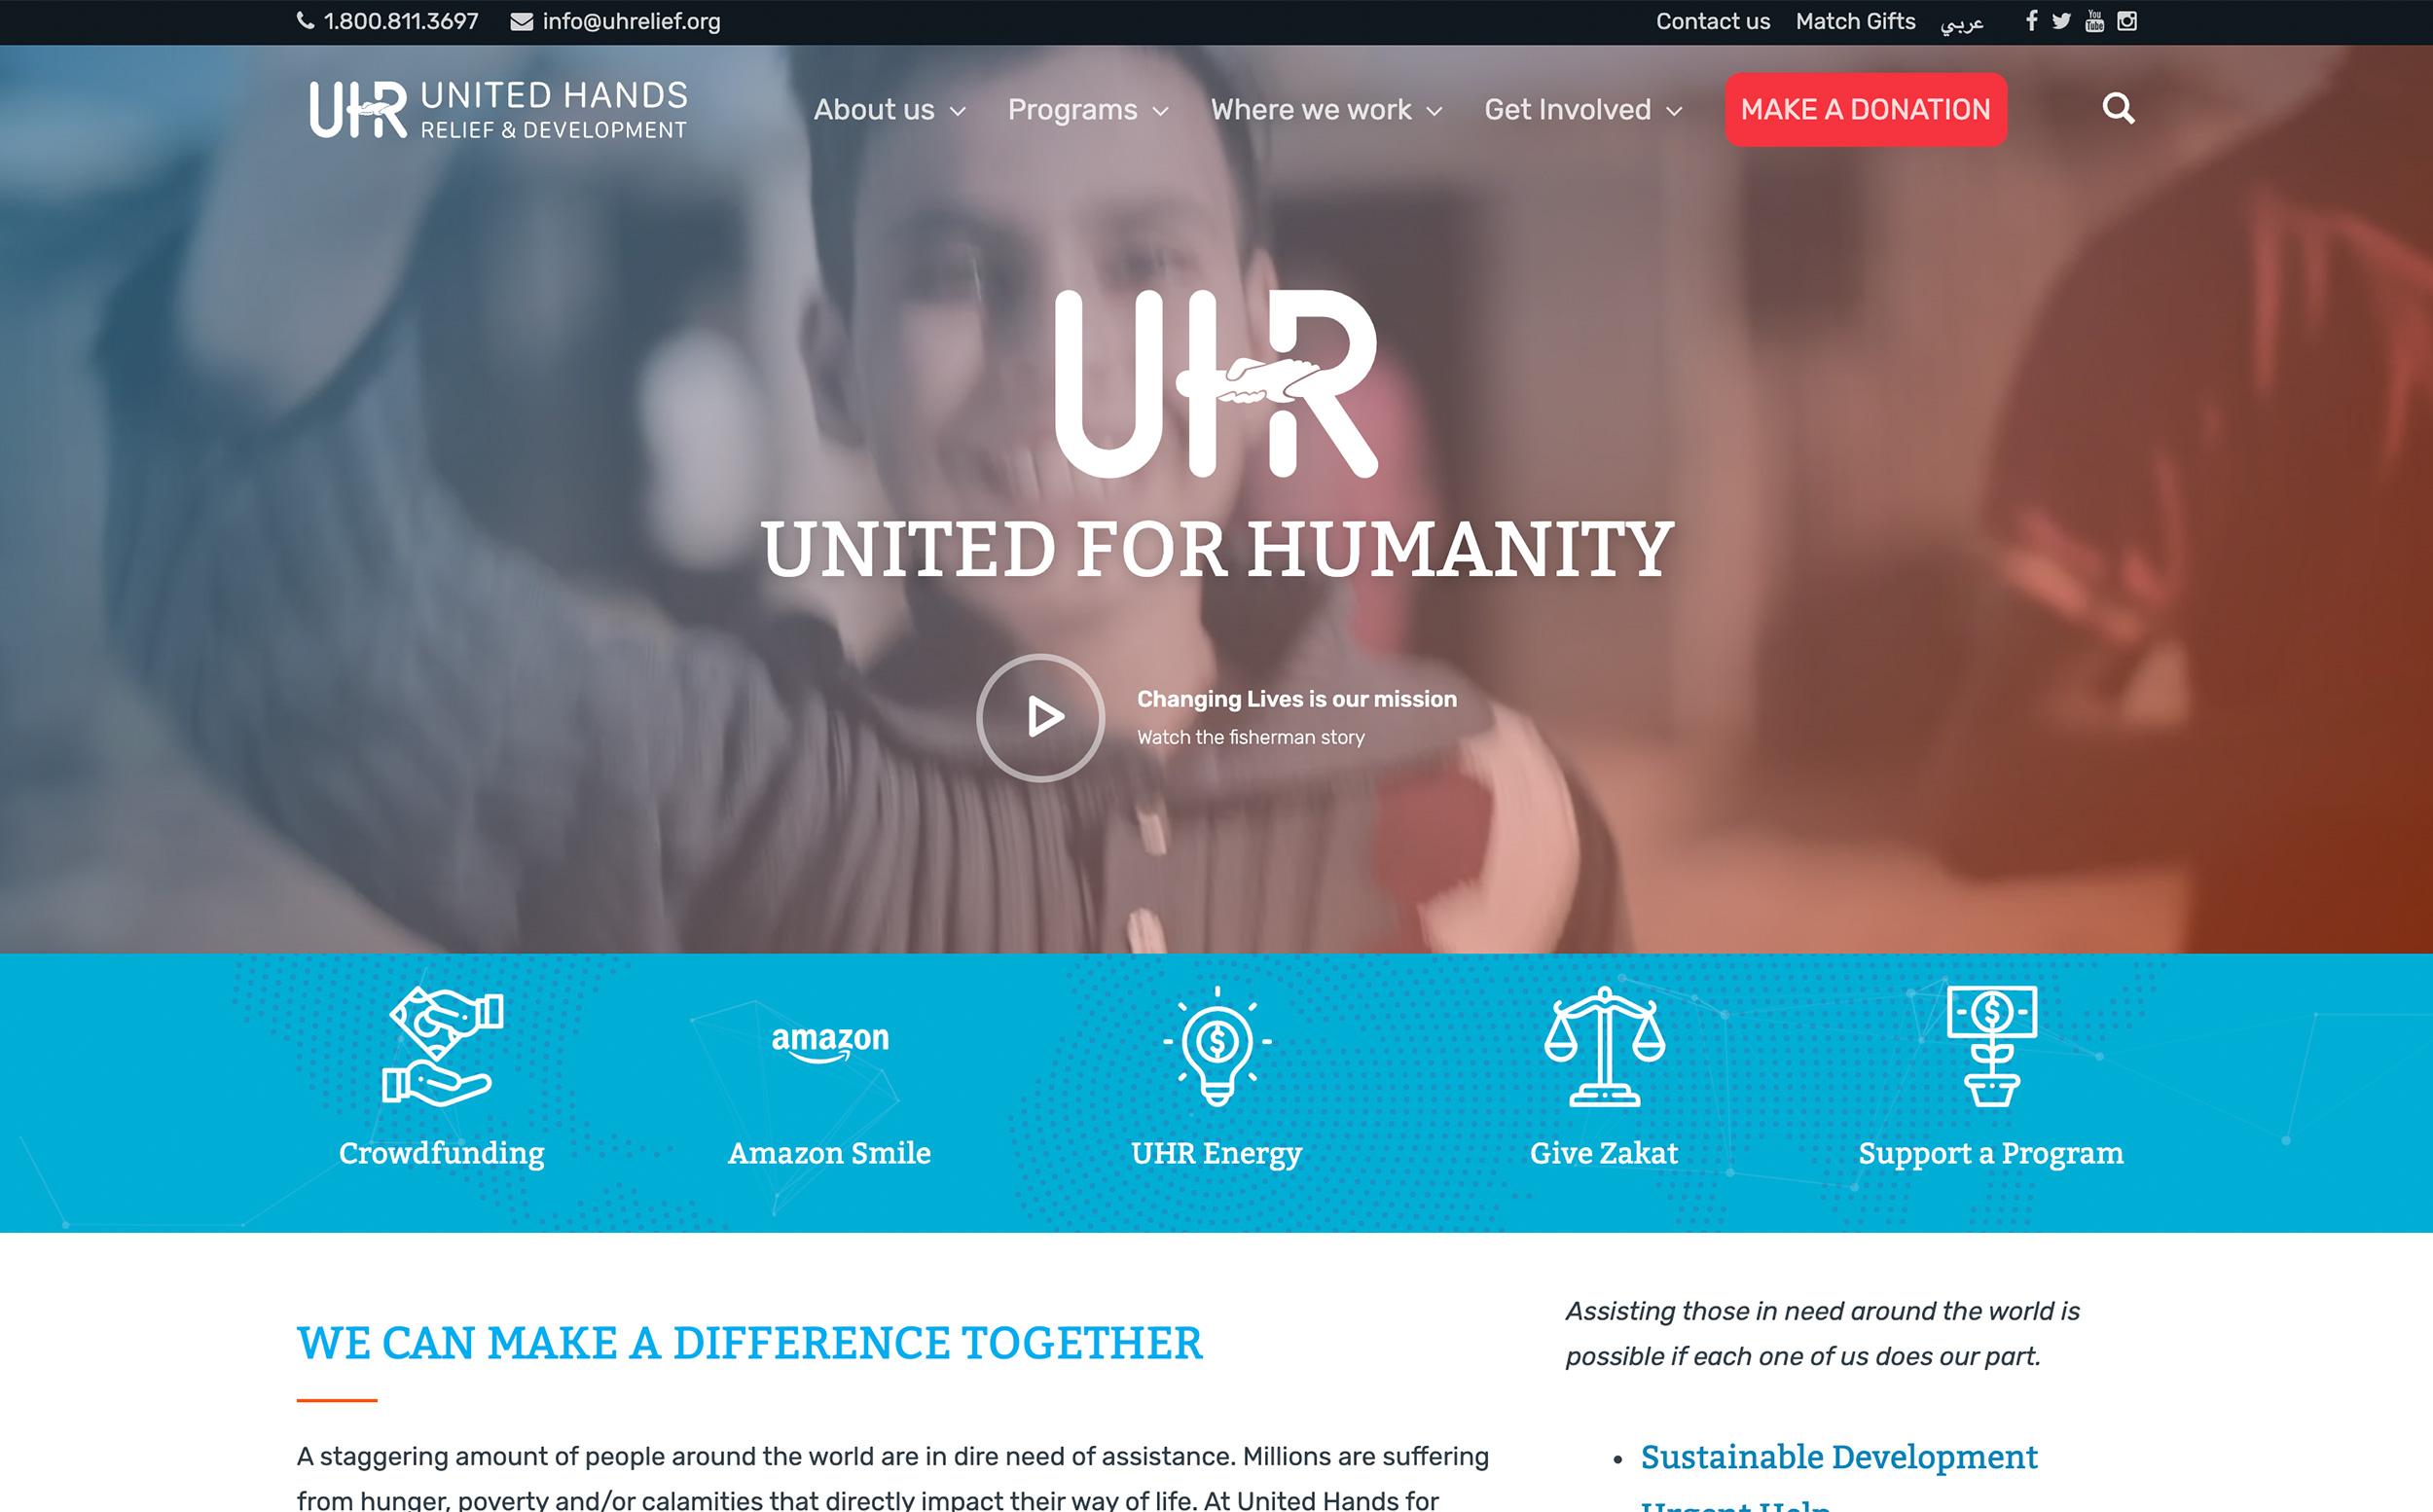 UHR website homepage